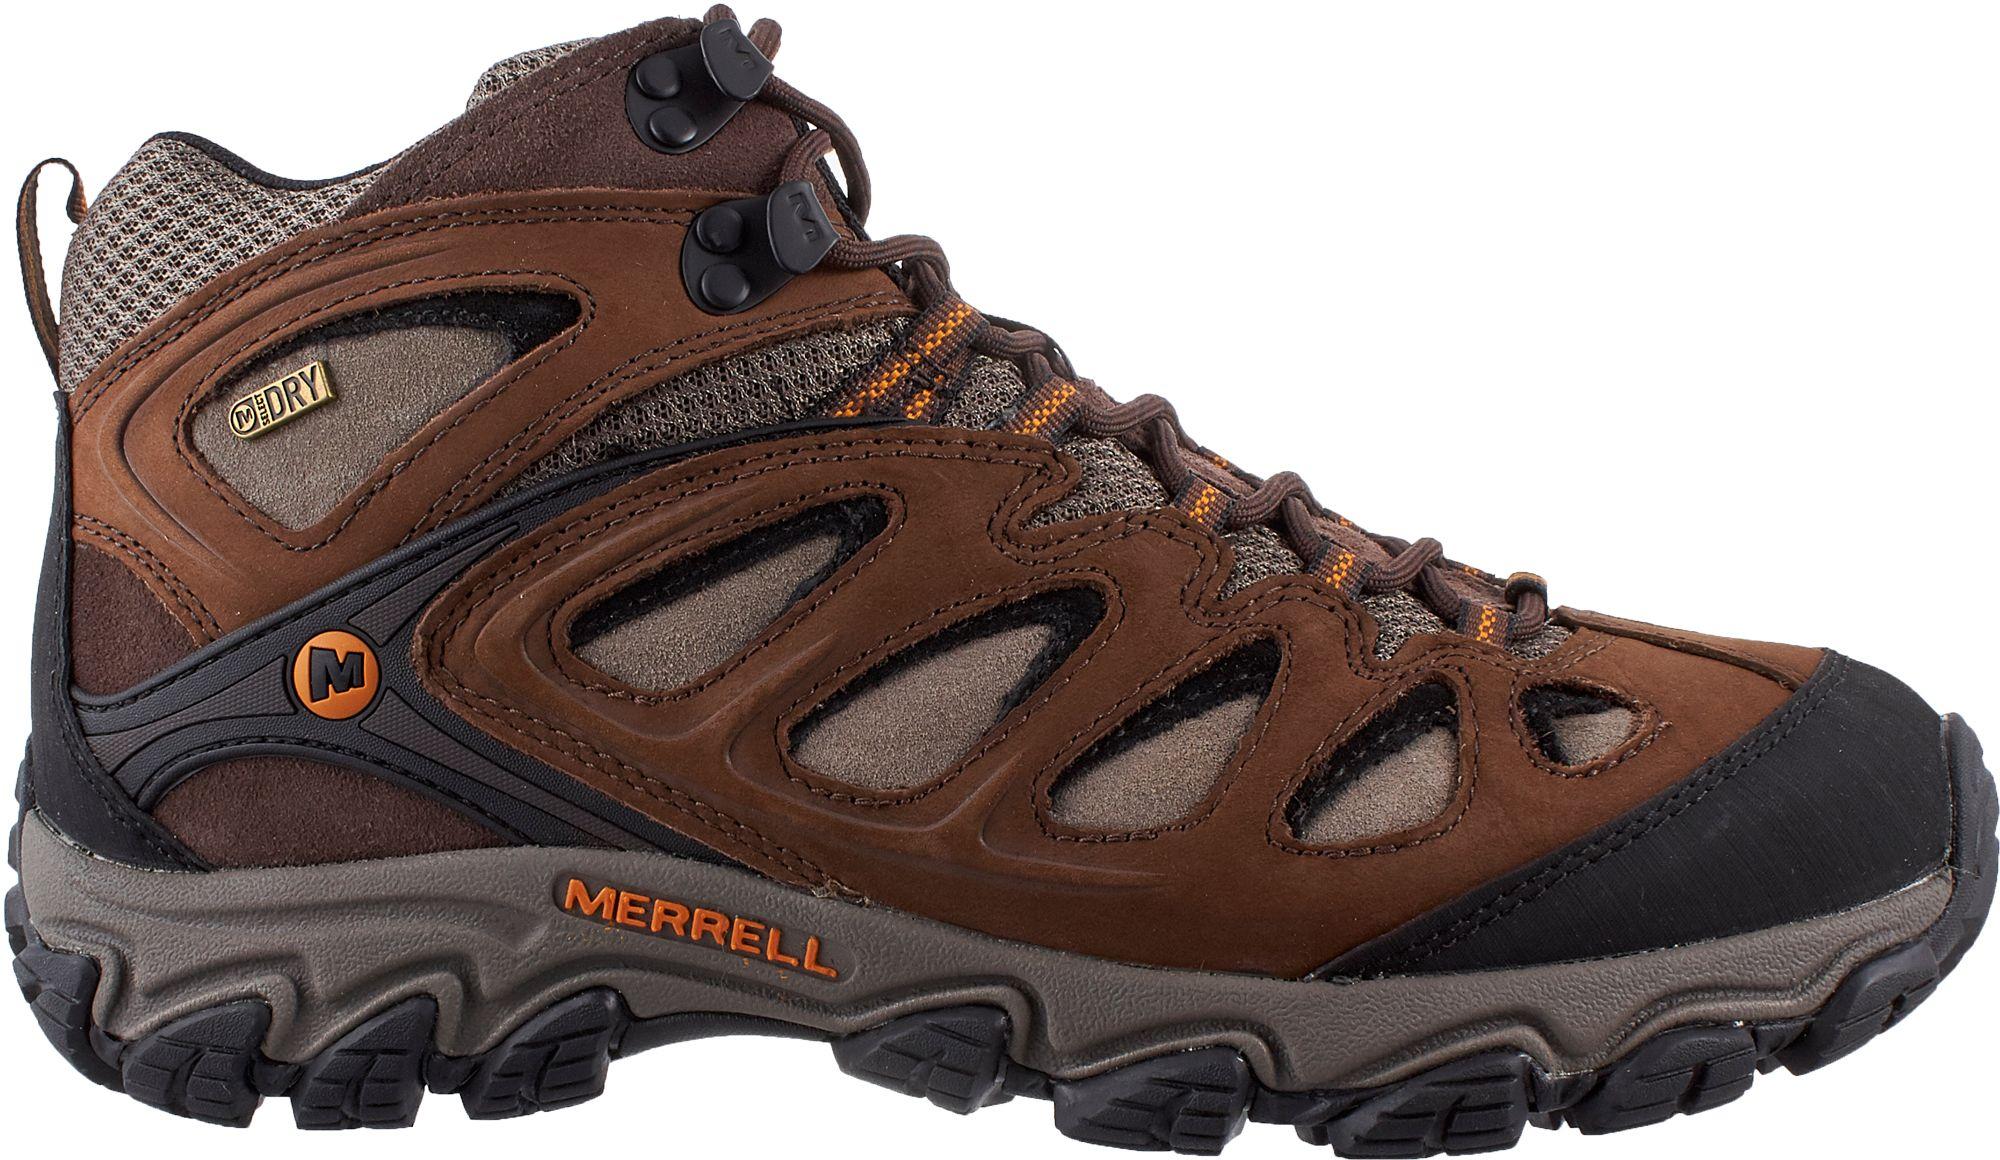 Men's Boots & Outdoor Shoes   DICK'S Sporting Goods